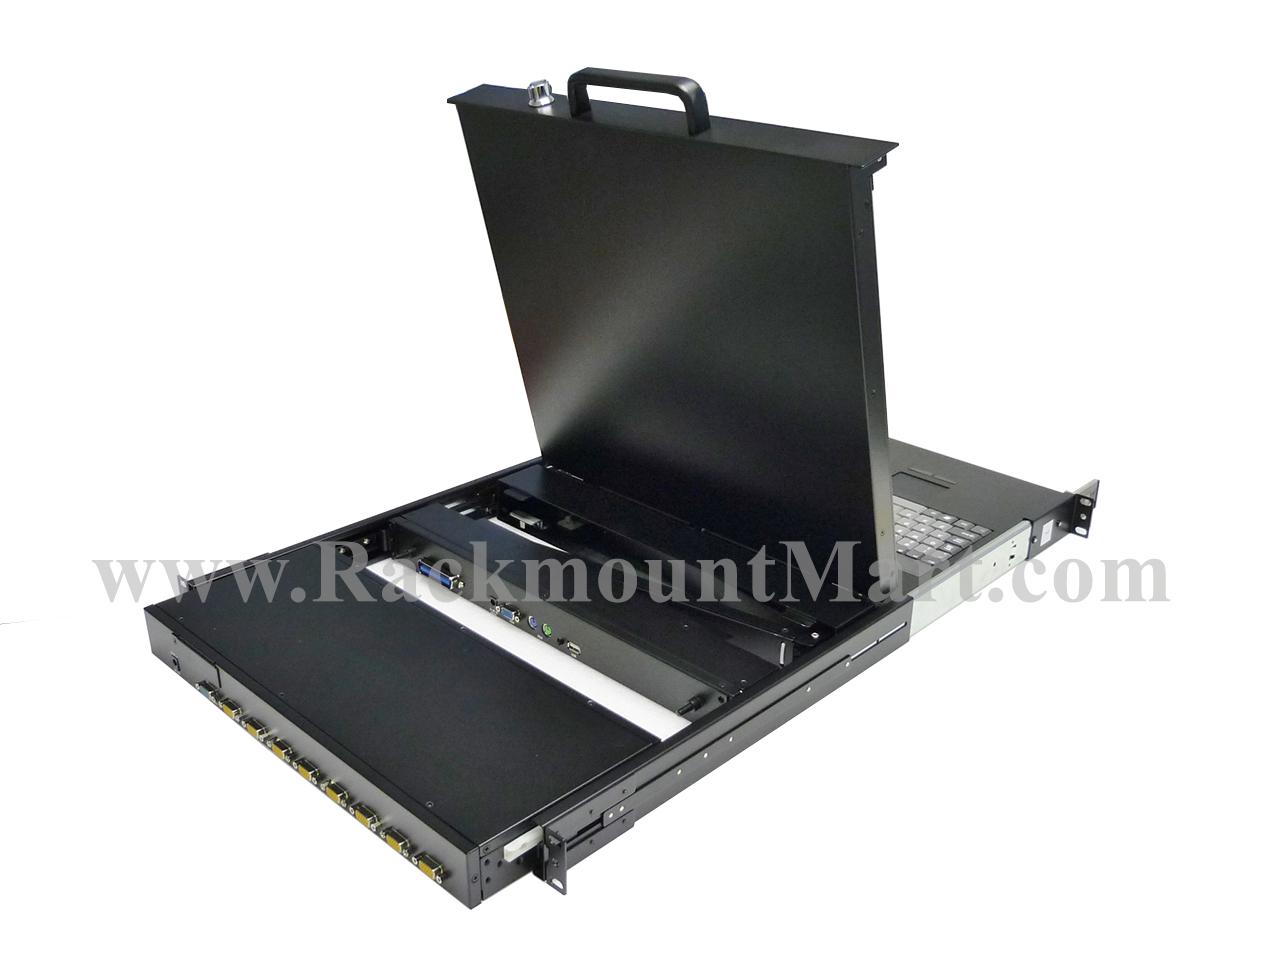 Rackmount Mart - 19 Inch Rackmount LCD Monitor & Rackmount